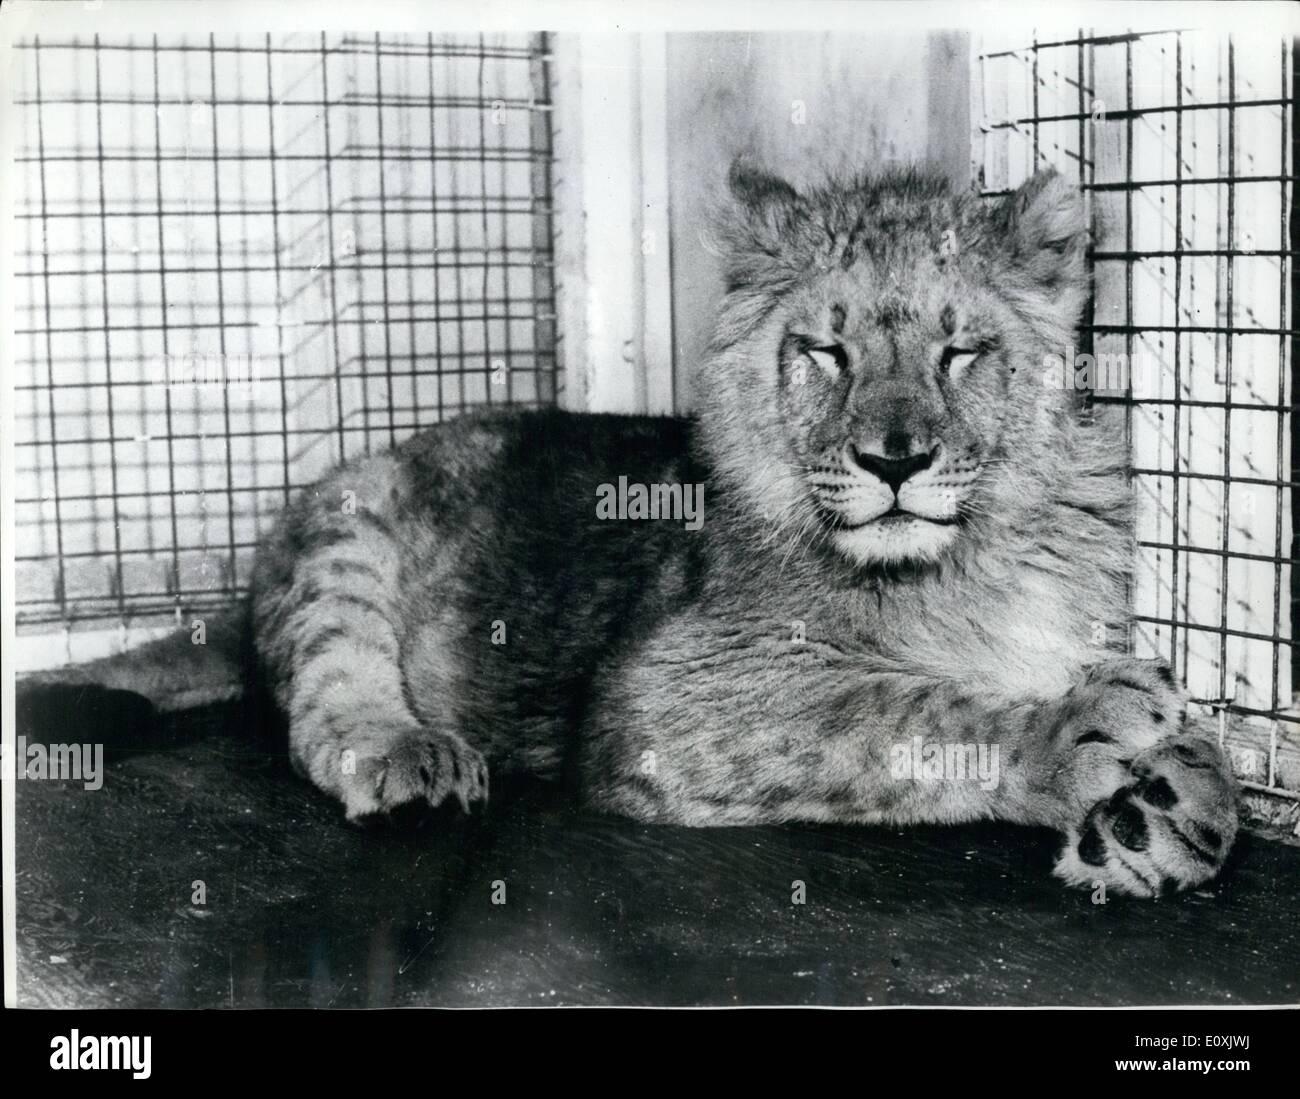 1967 Cat Stockfotos & 1967 Cat Bilder - Alamy